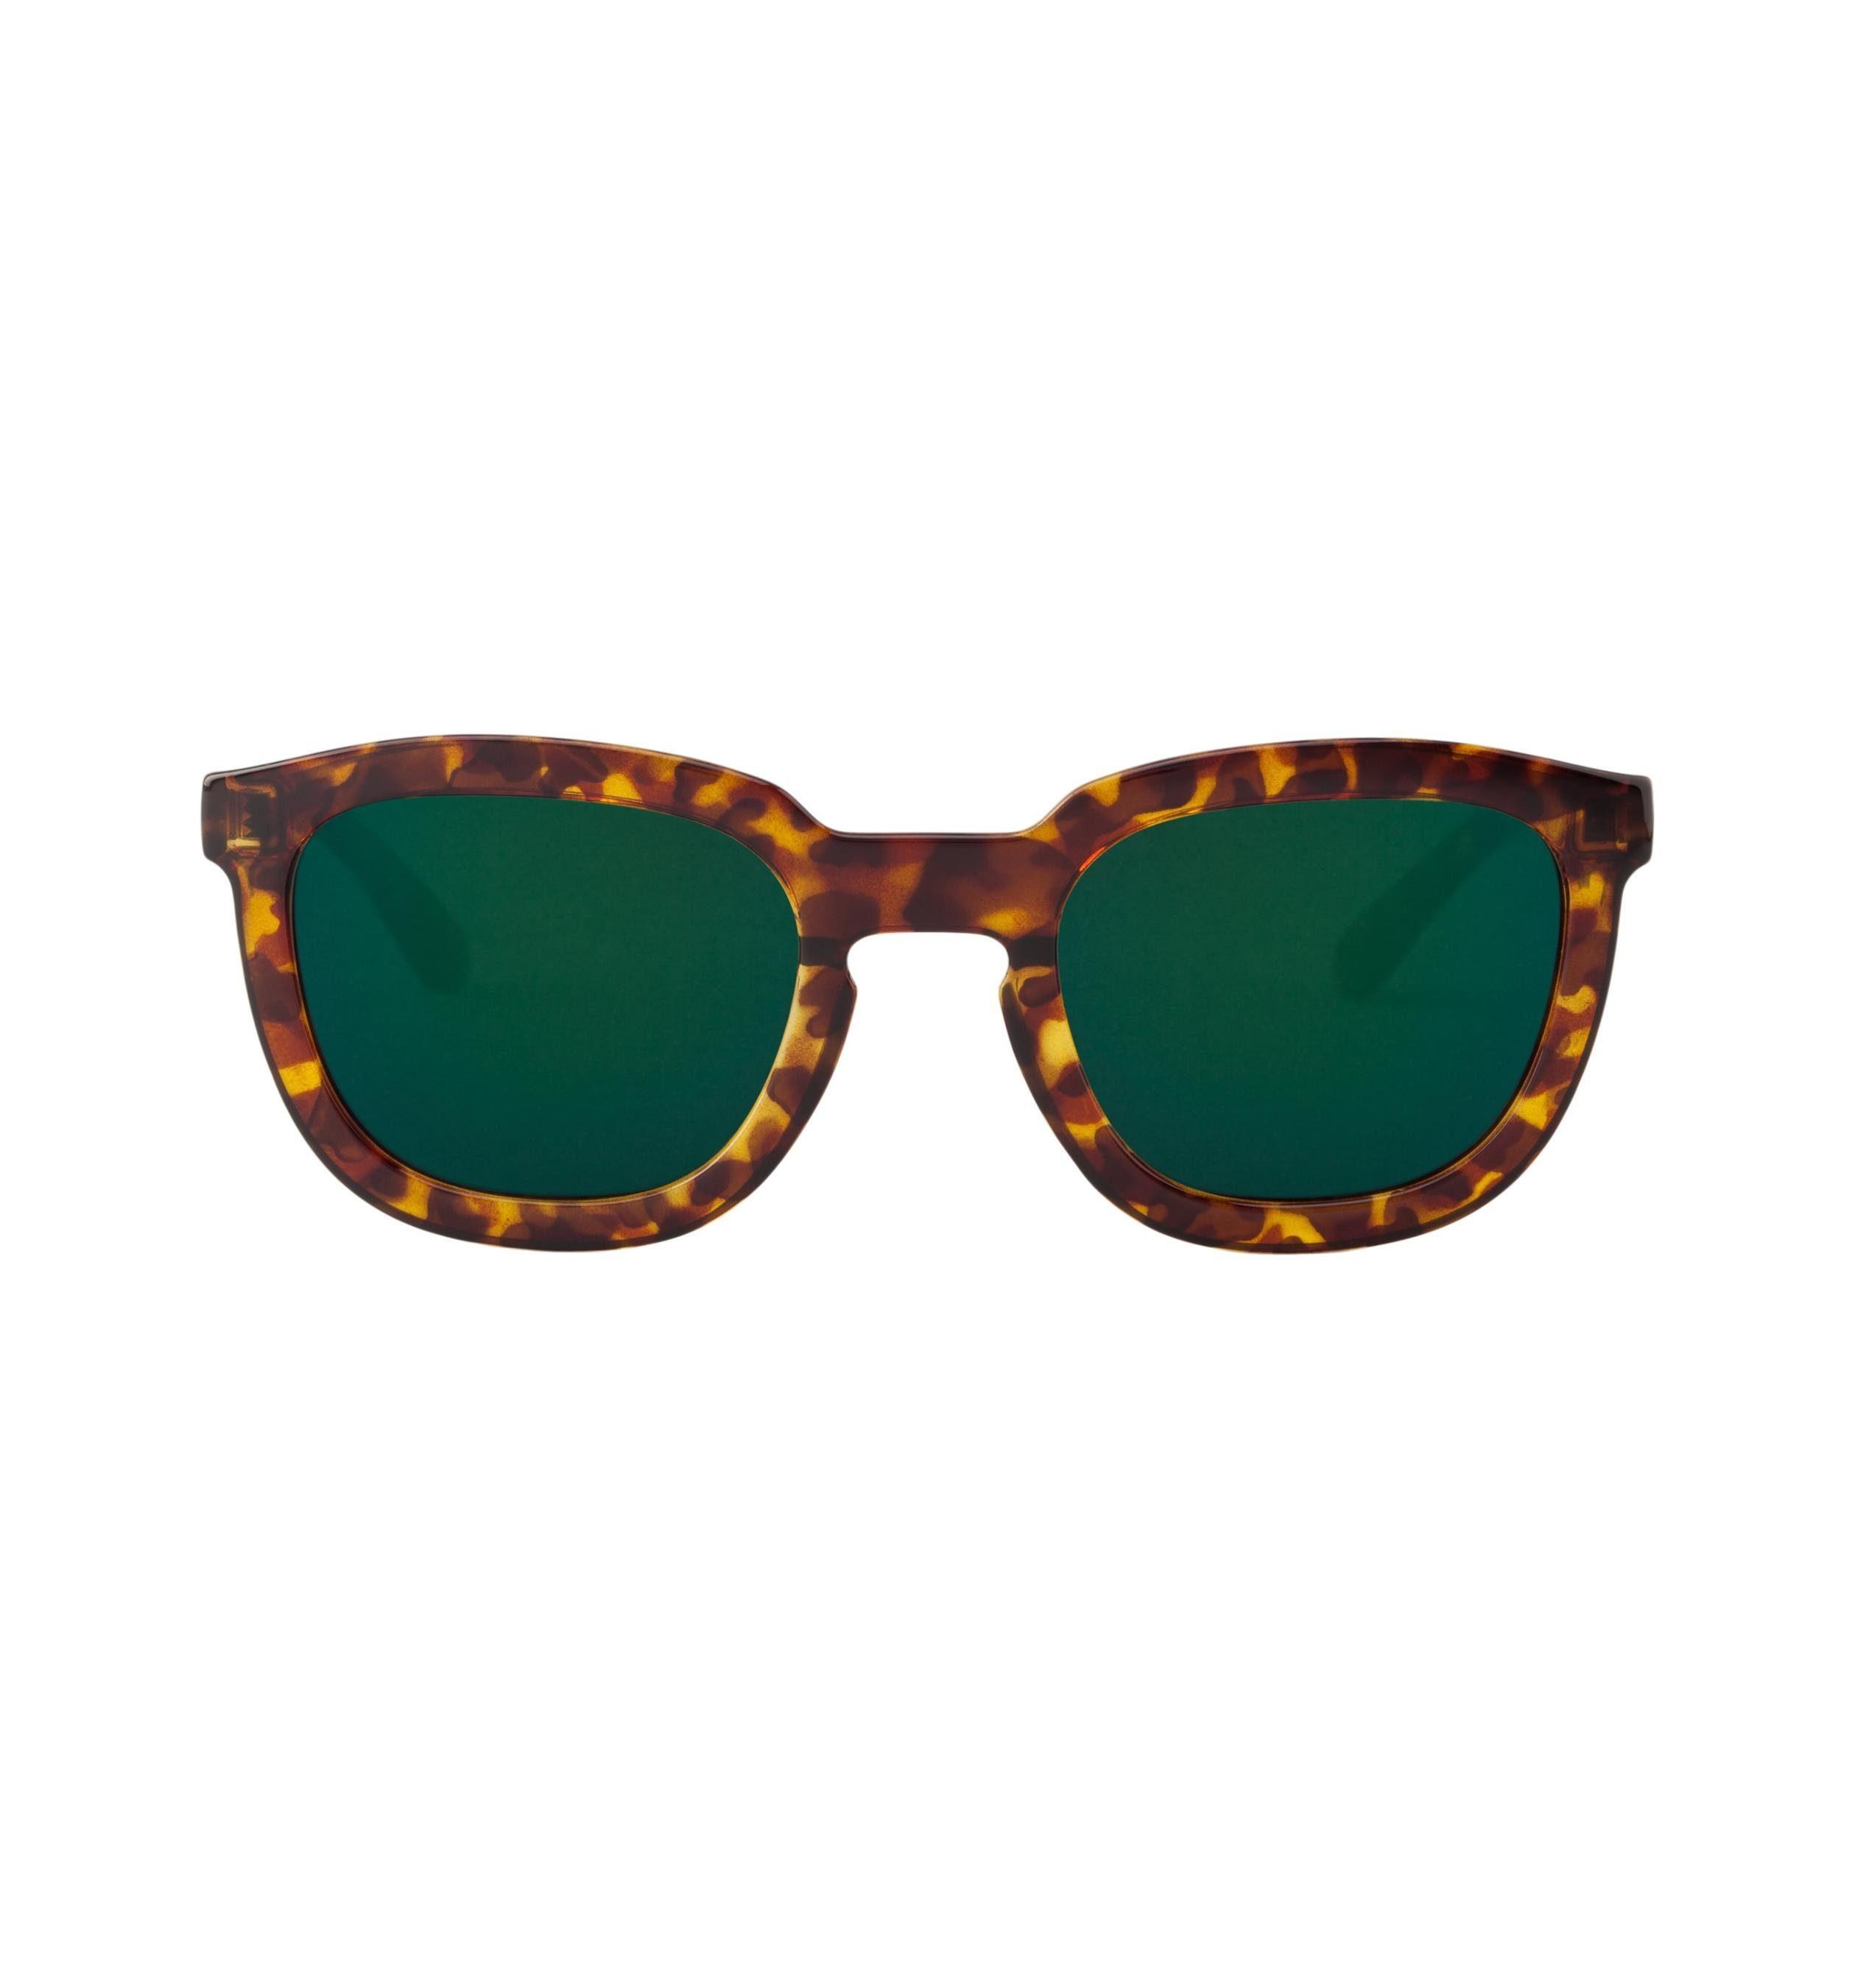 Mr. Boho Sonnenbrille »Cheetah Tortoise Lemarais mit dunkelgrünen Gläsern«